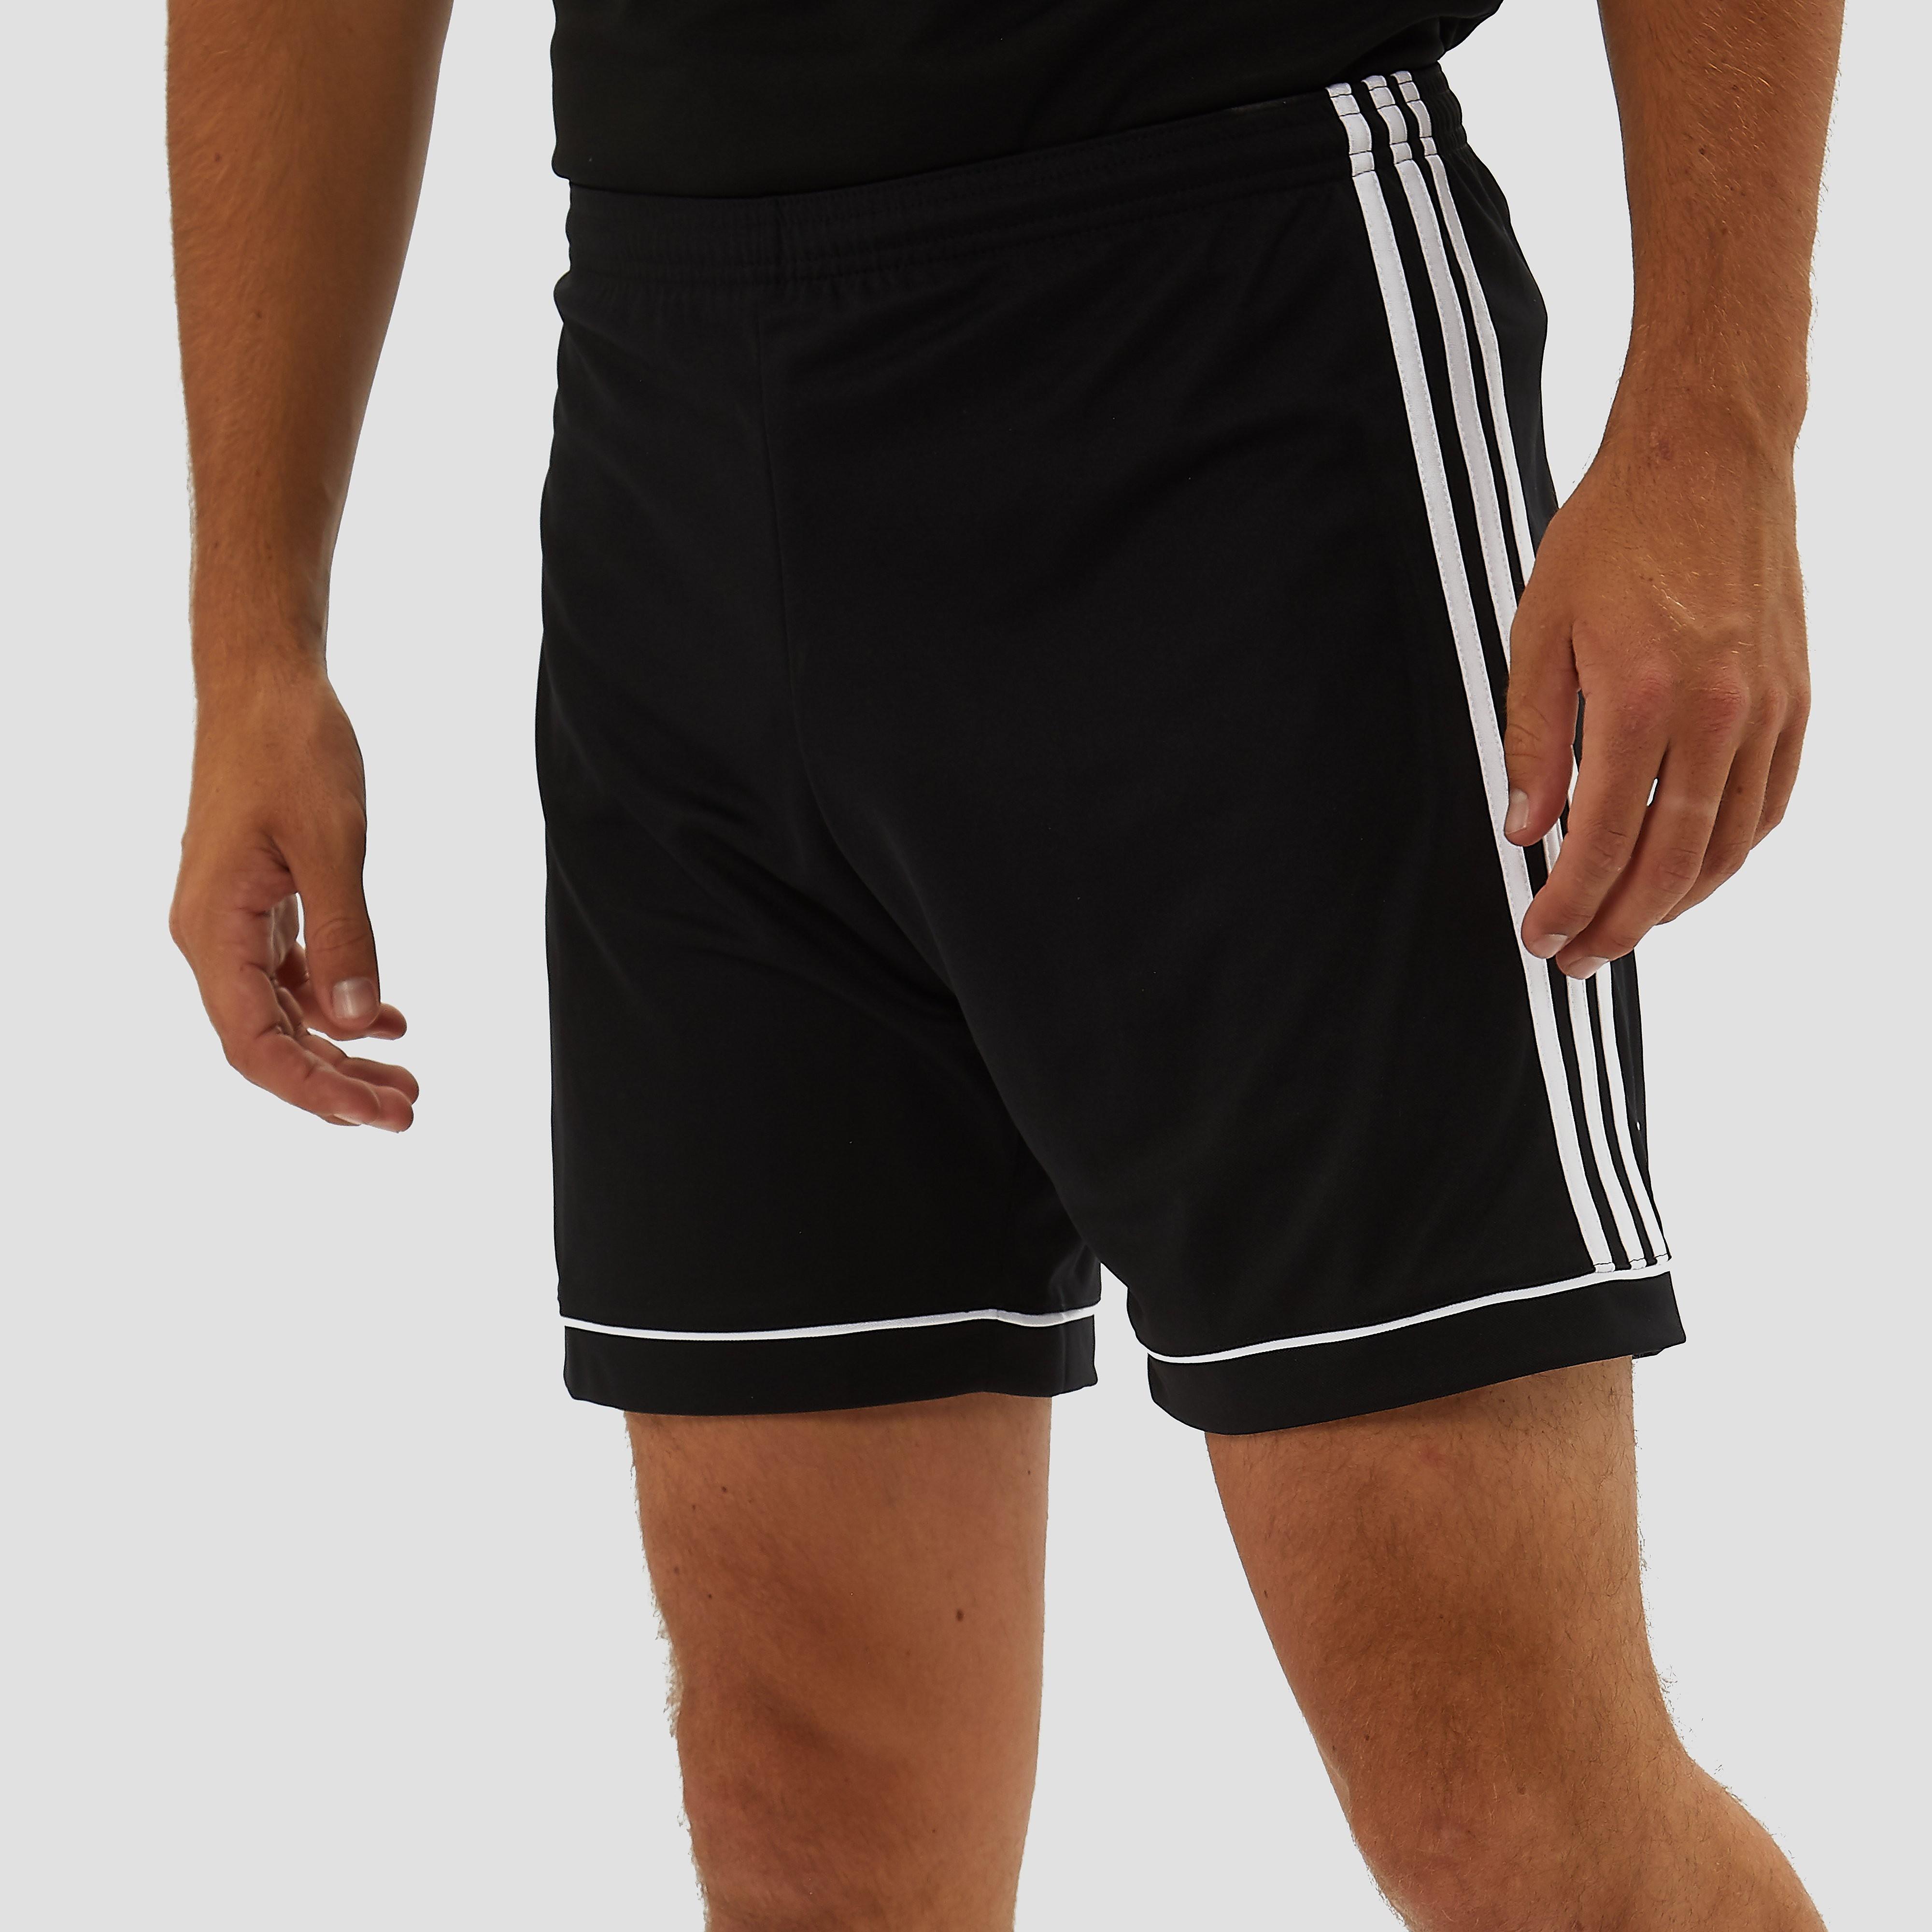 NU 20% KORTING: adidas Performance functionele short Squadra 17